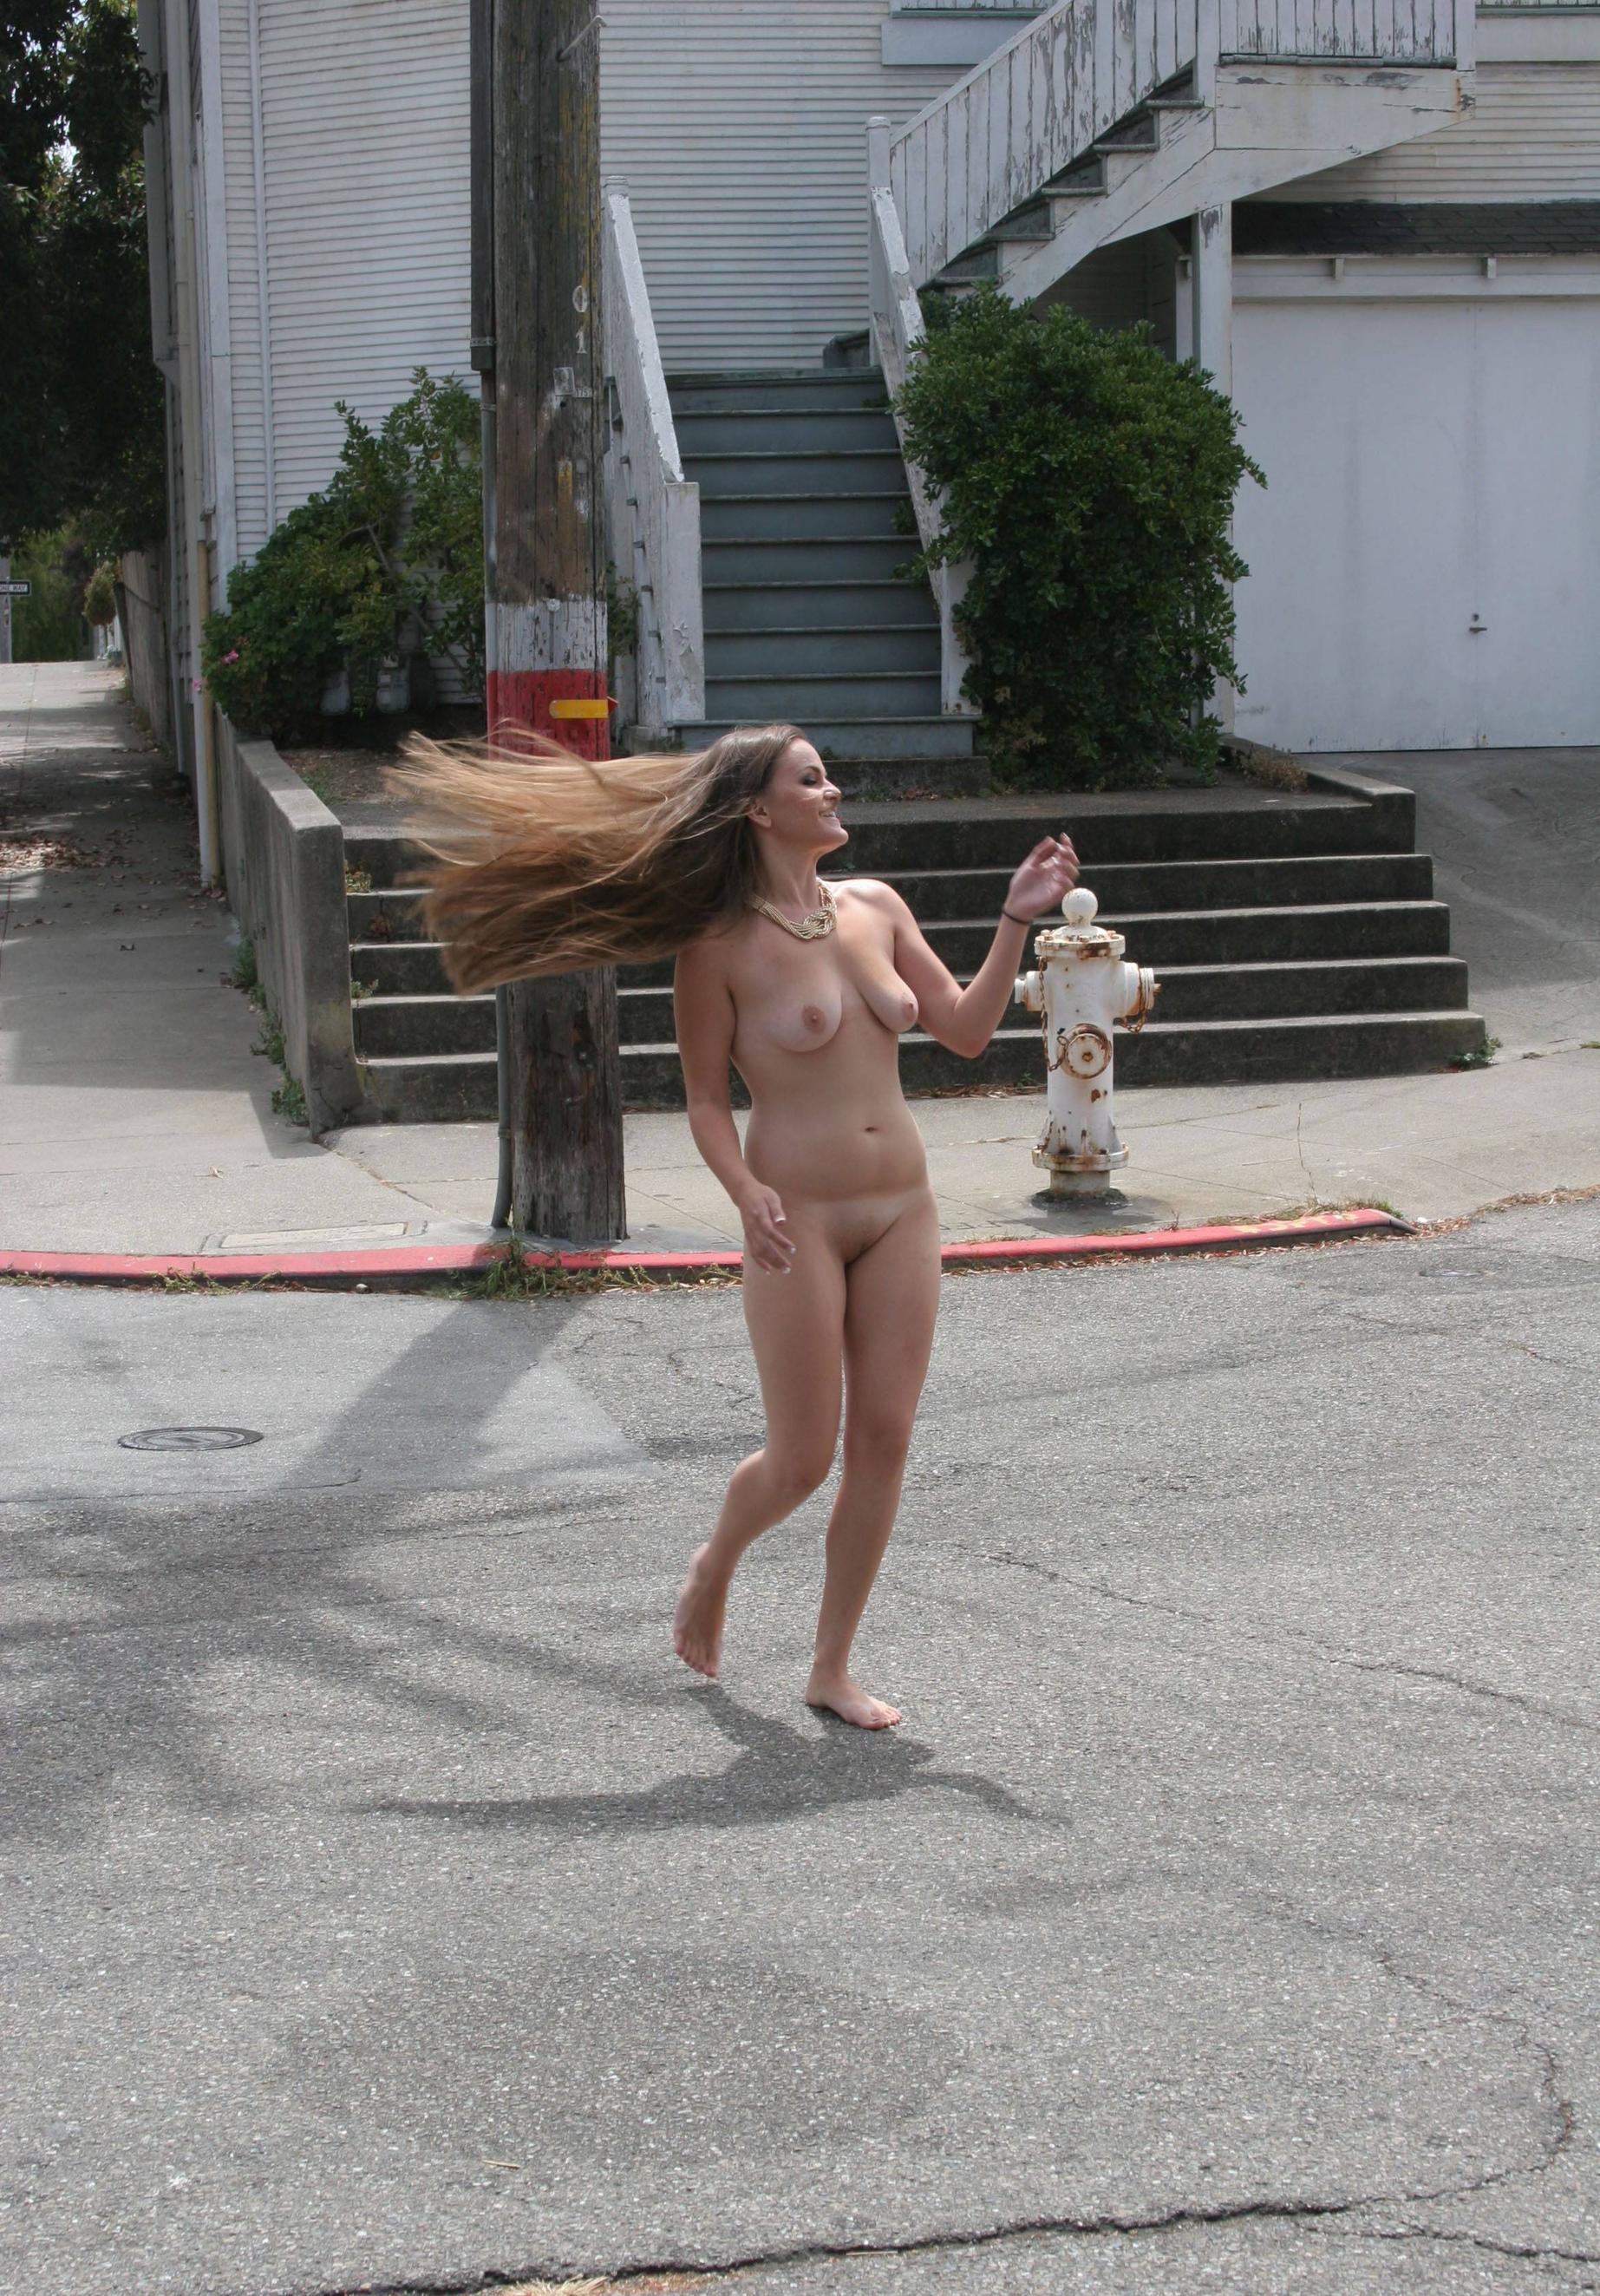 Long haired babe walks around naked